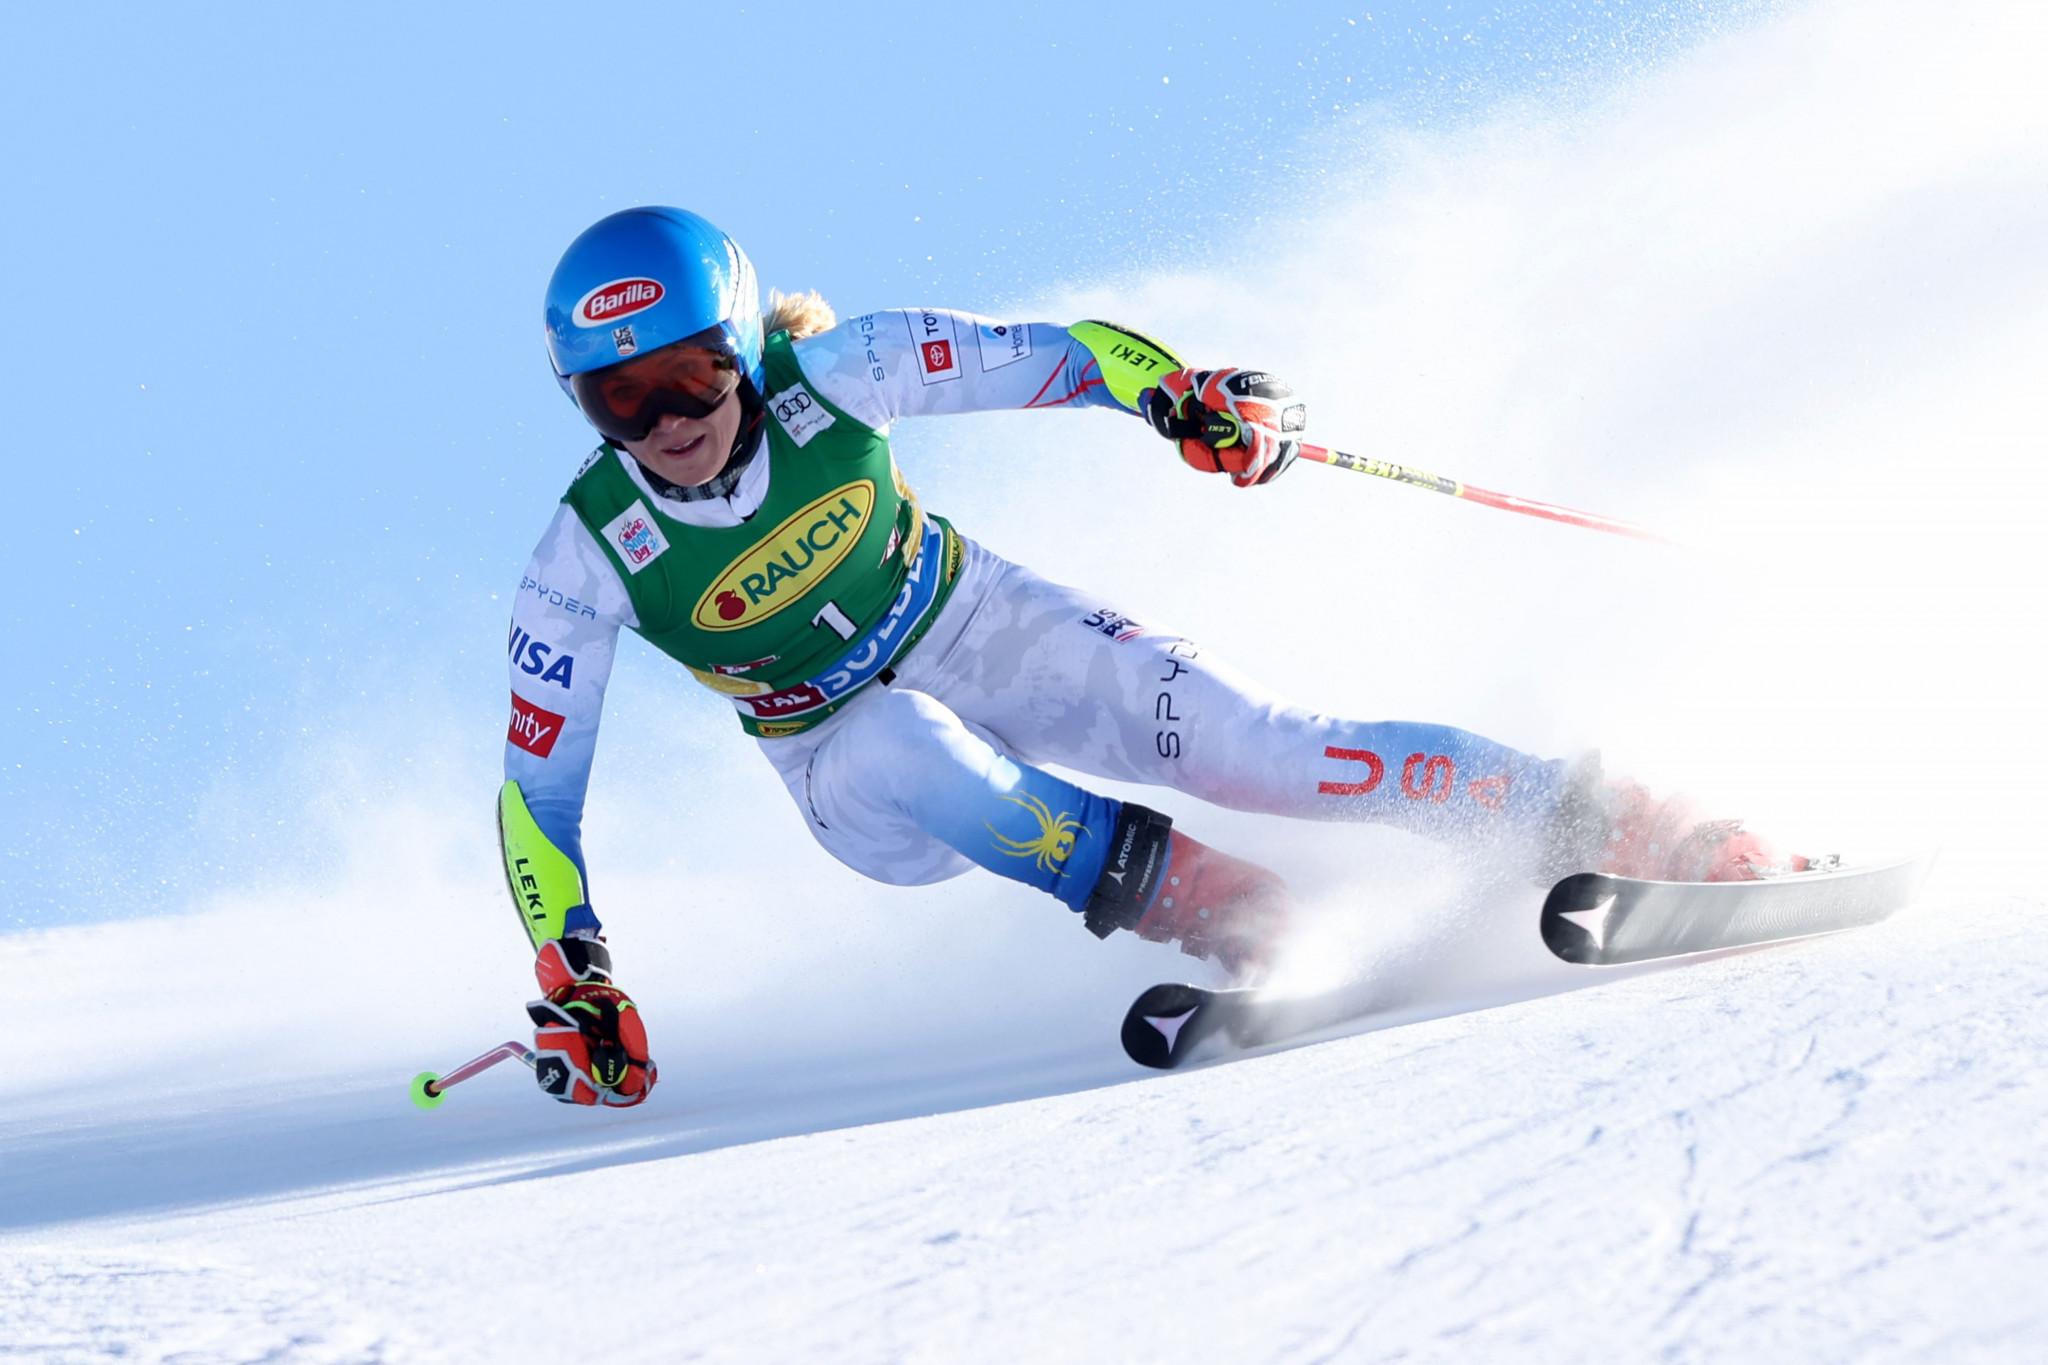 Shiffrin triumphs at FIS Alpine Ski World Cup opener in Austria